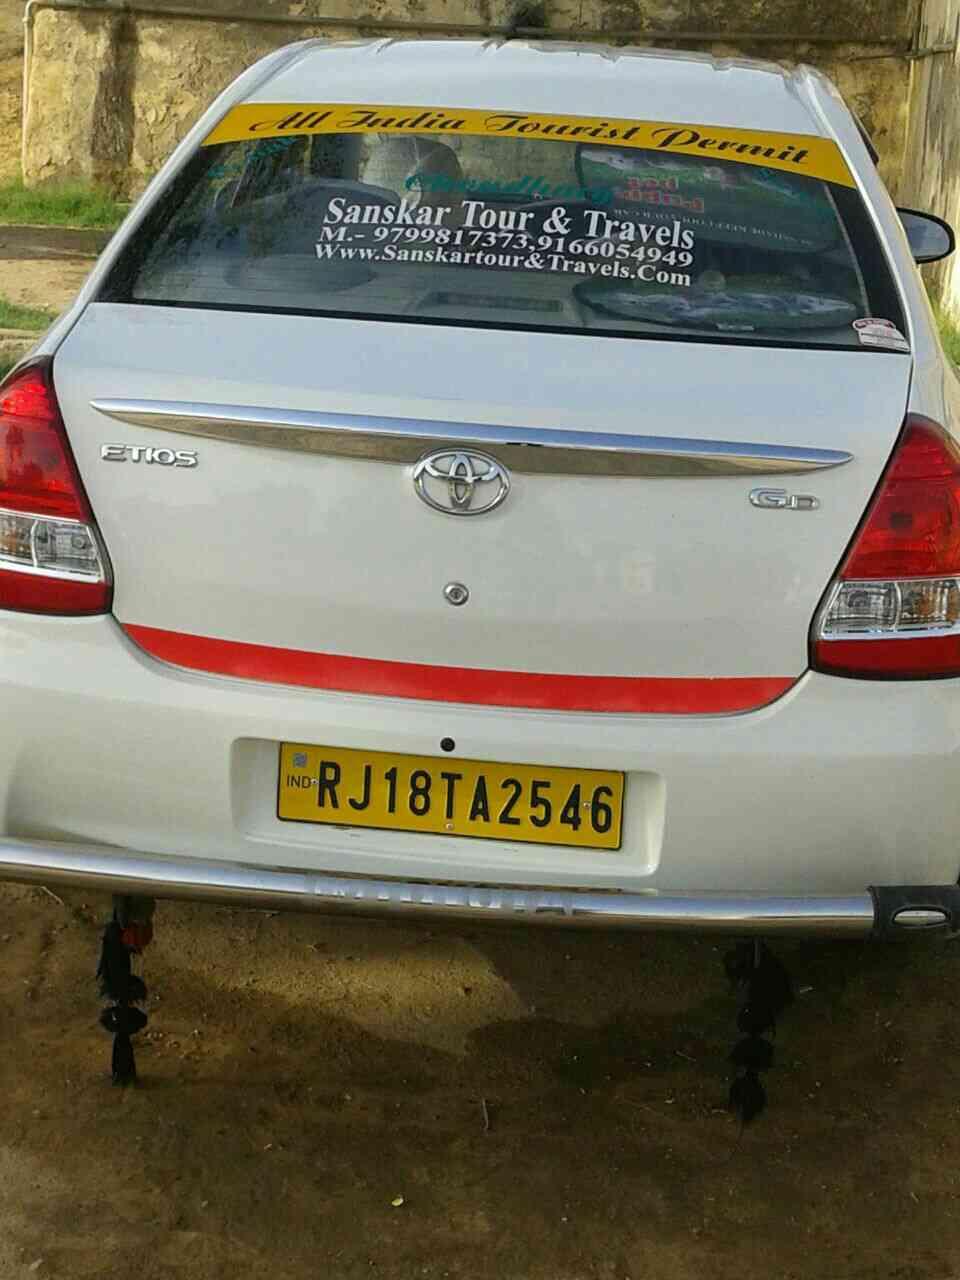 Sanskar Tours Jaipur  Delhi IGI DROP Dzire  Rs. 2800/- Innova Rs. 3800/- Toll  Including  Call  09166054949